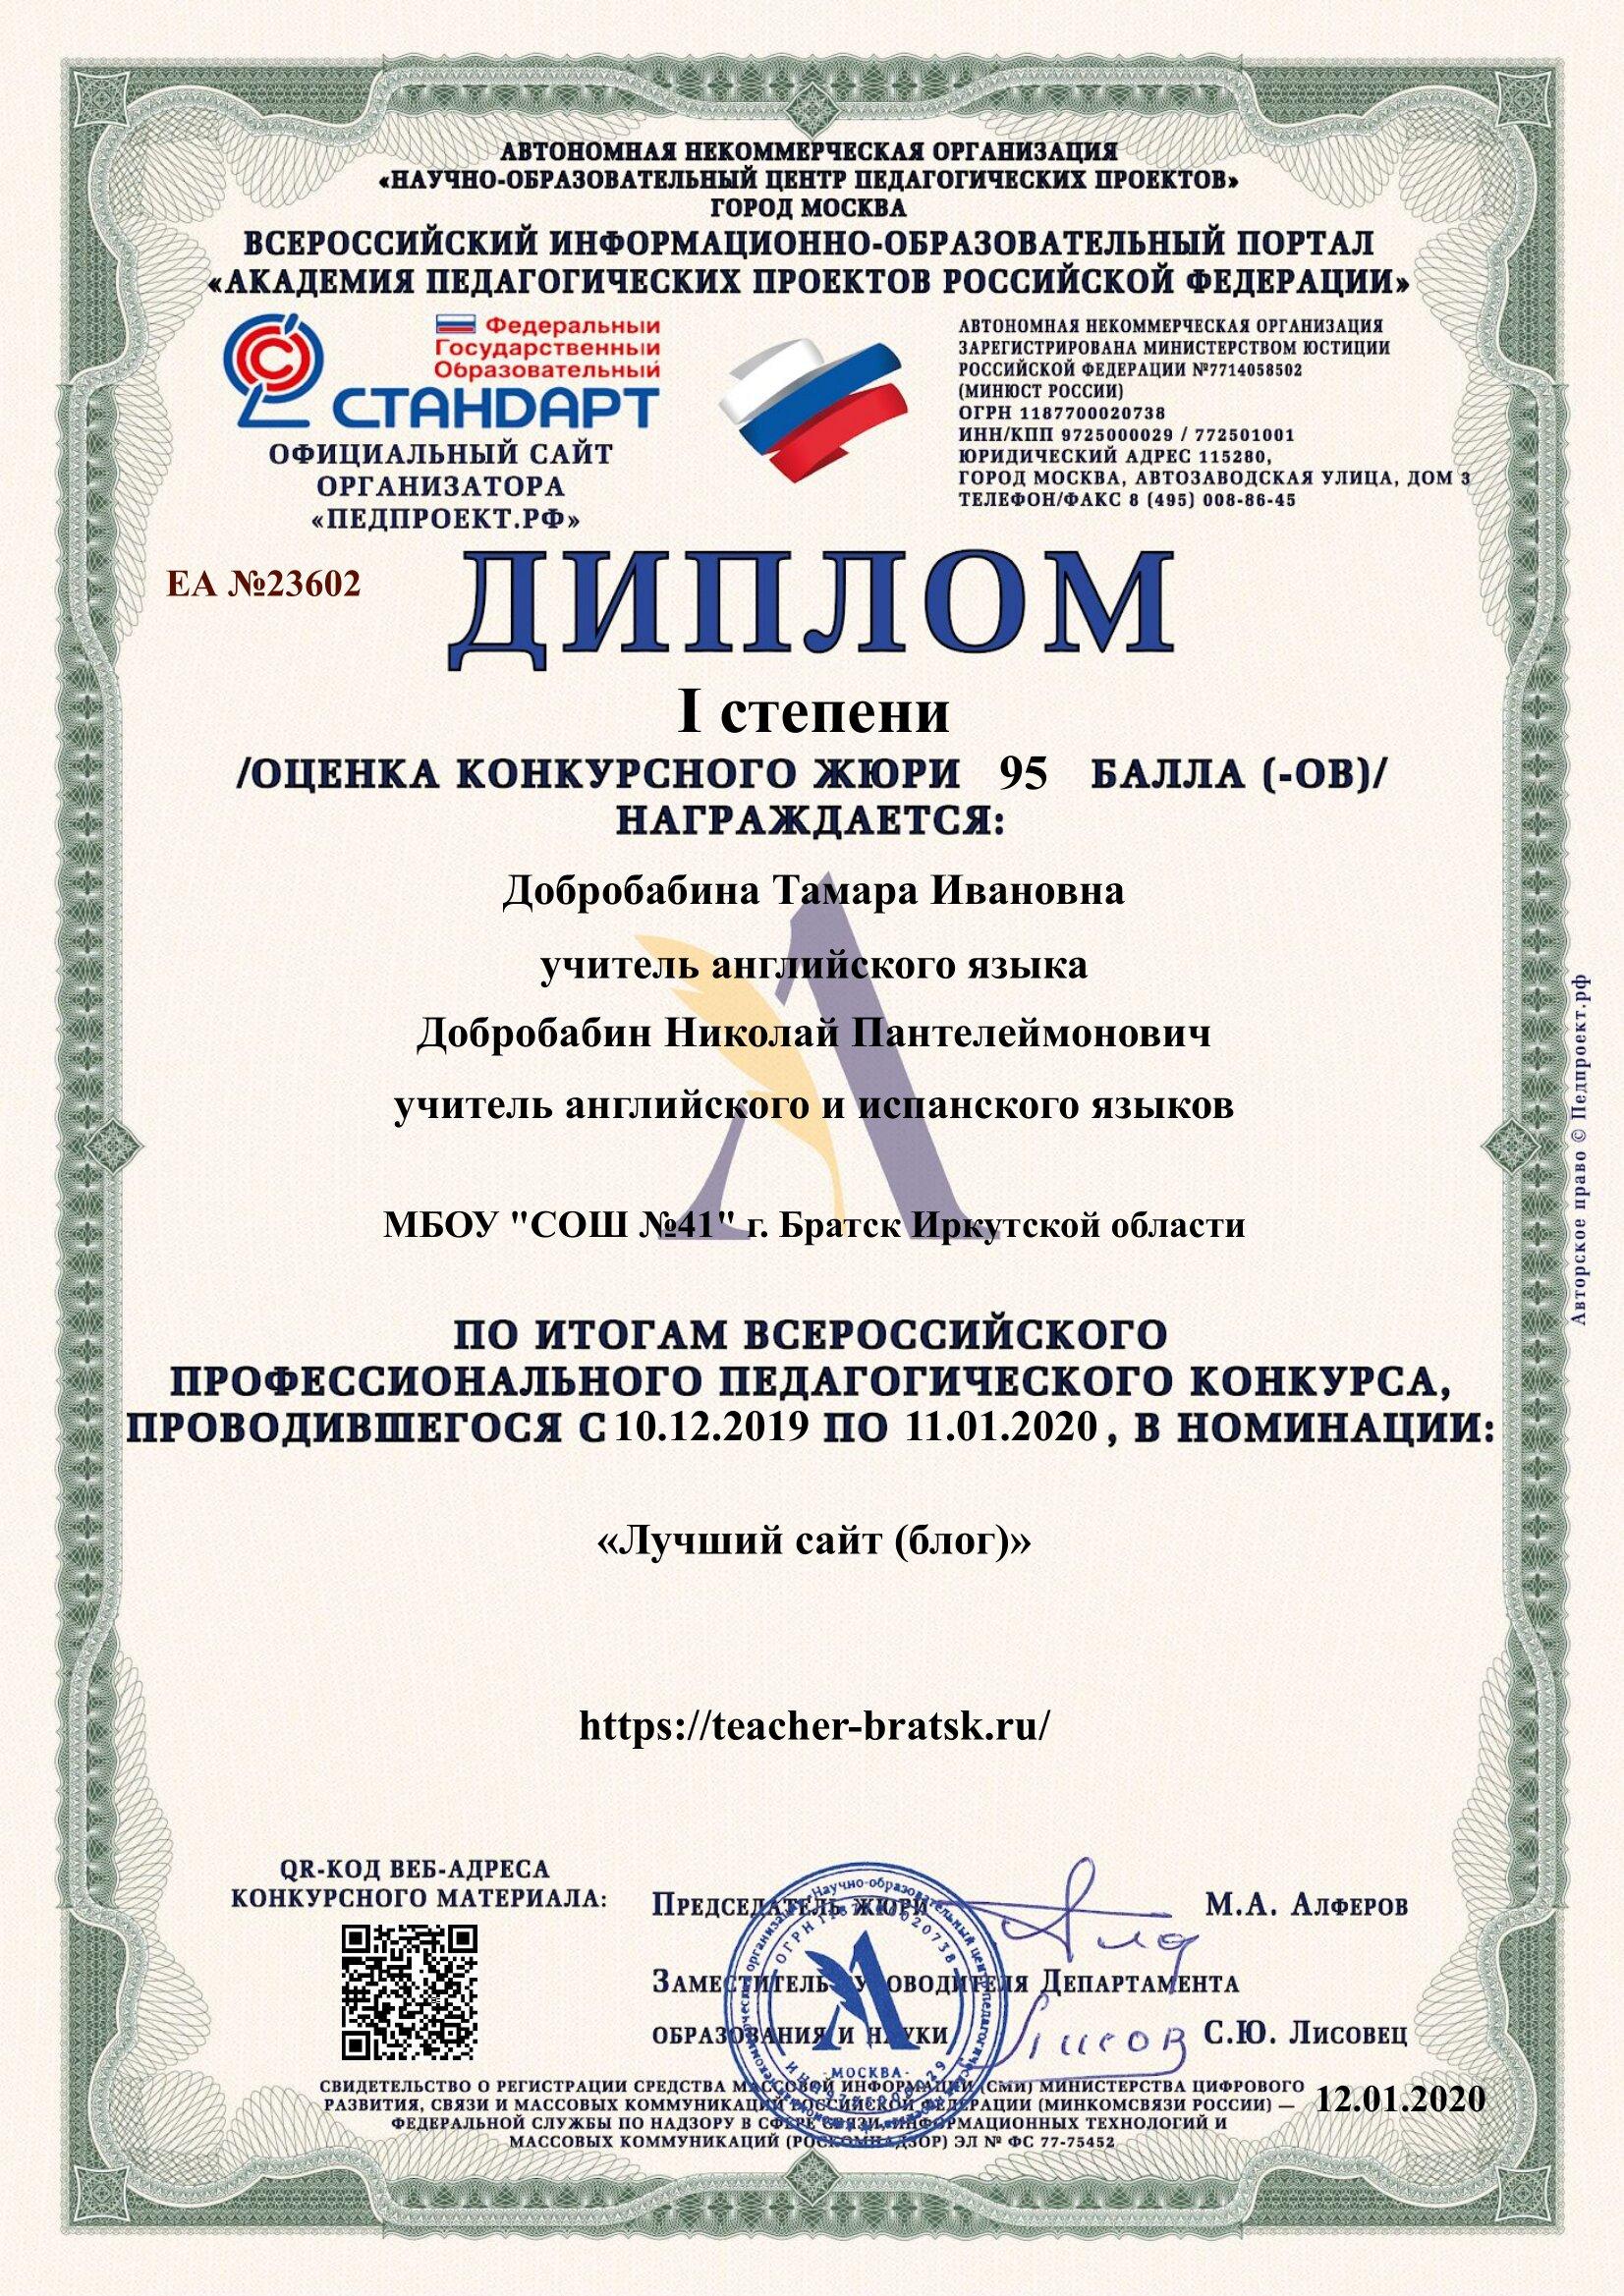 педпроект.рф